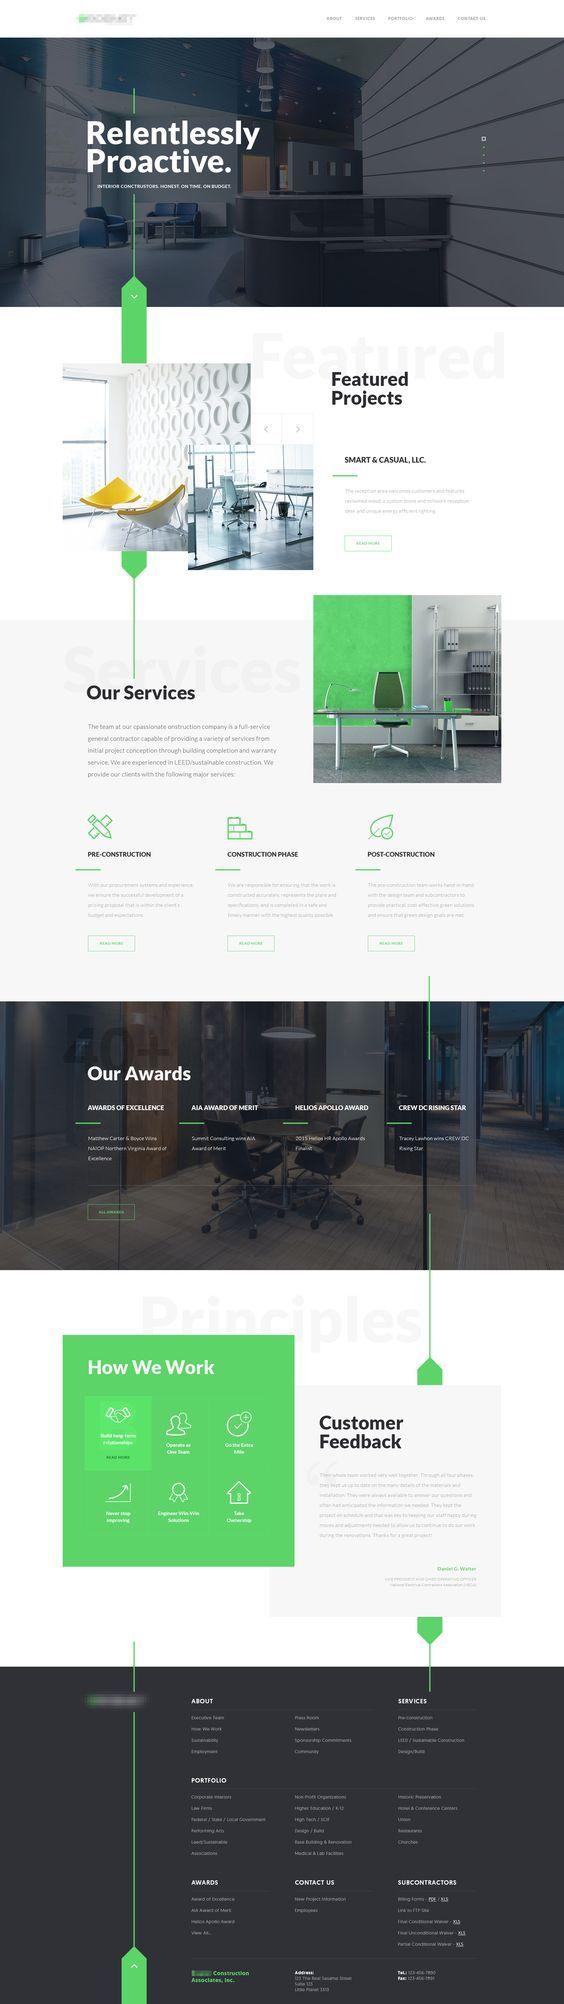 Interior Construction Company Website Design: